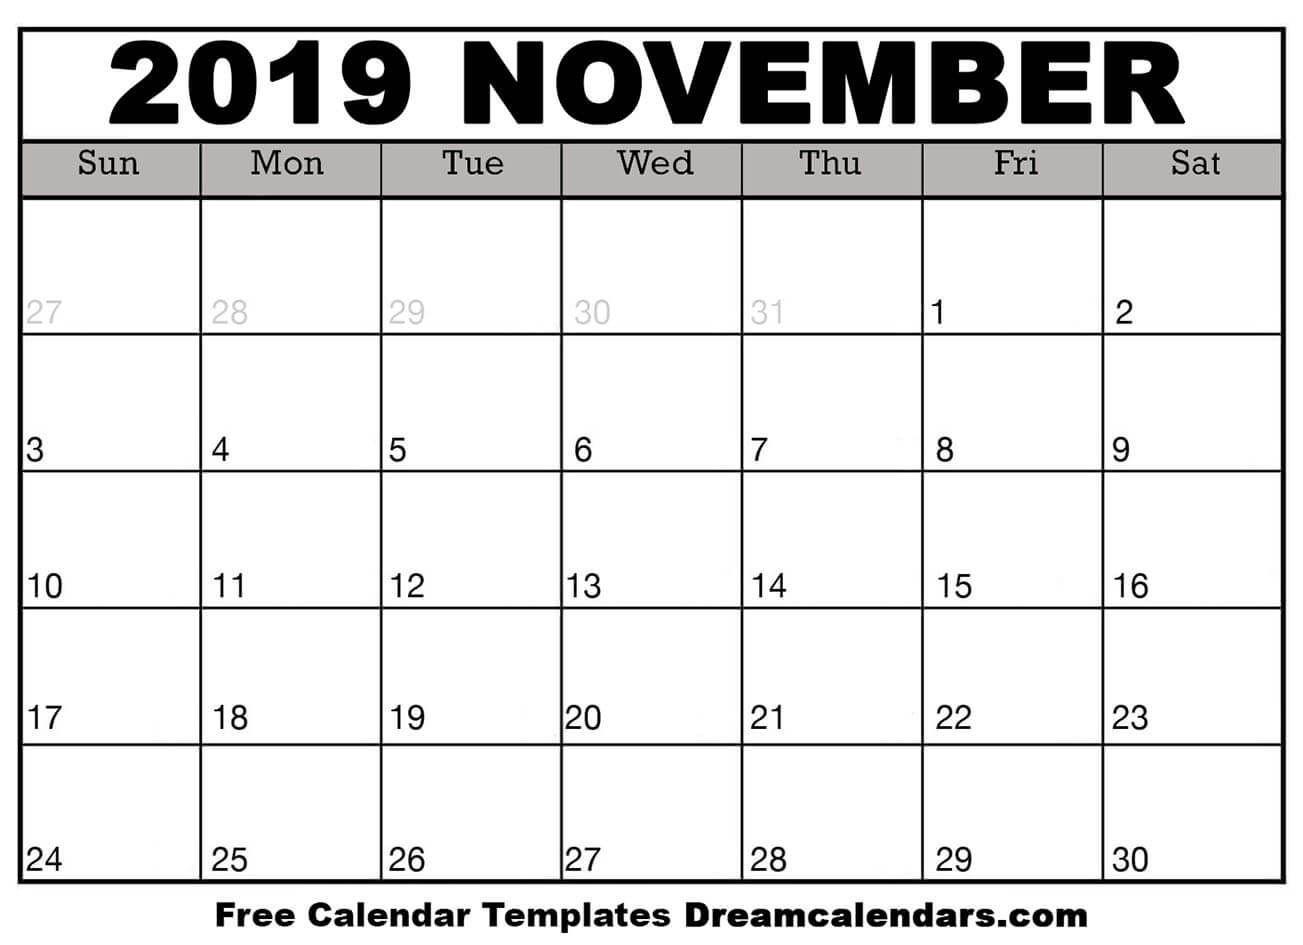 Template November Calendar 2019 Printable | Monthly Calendar